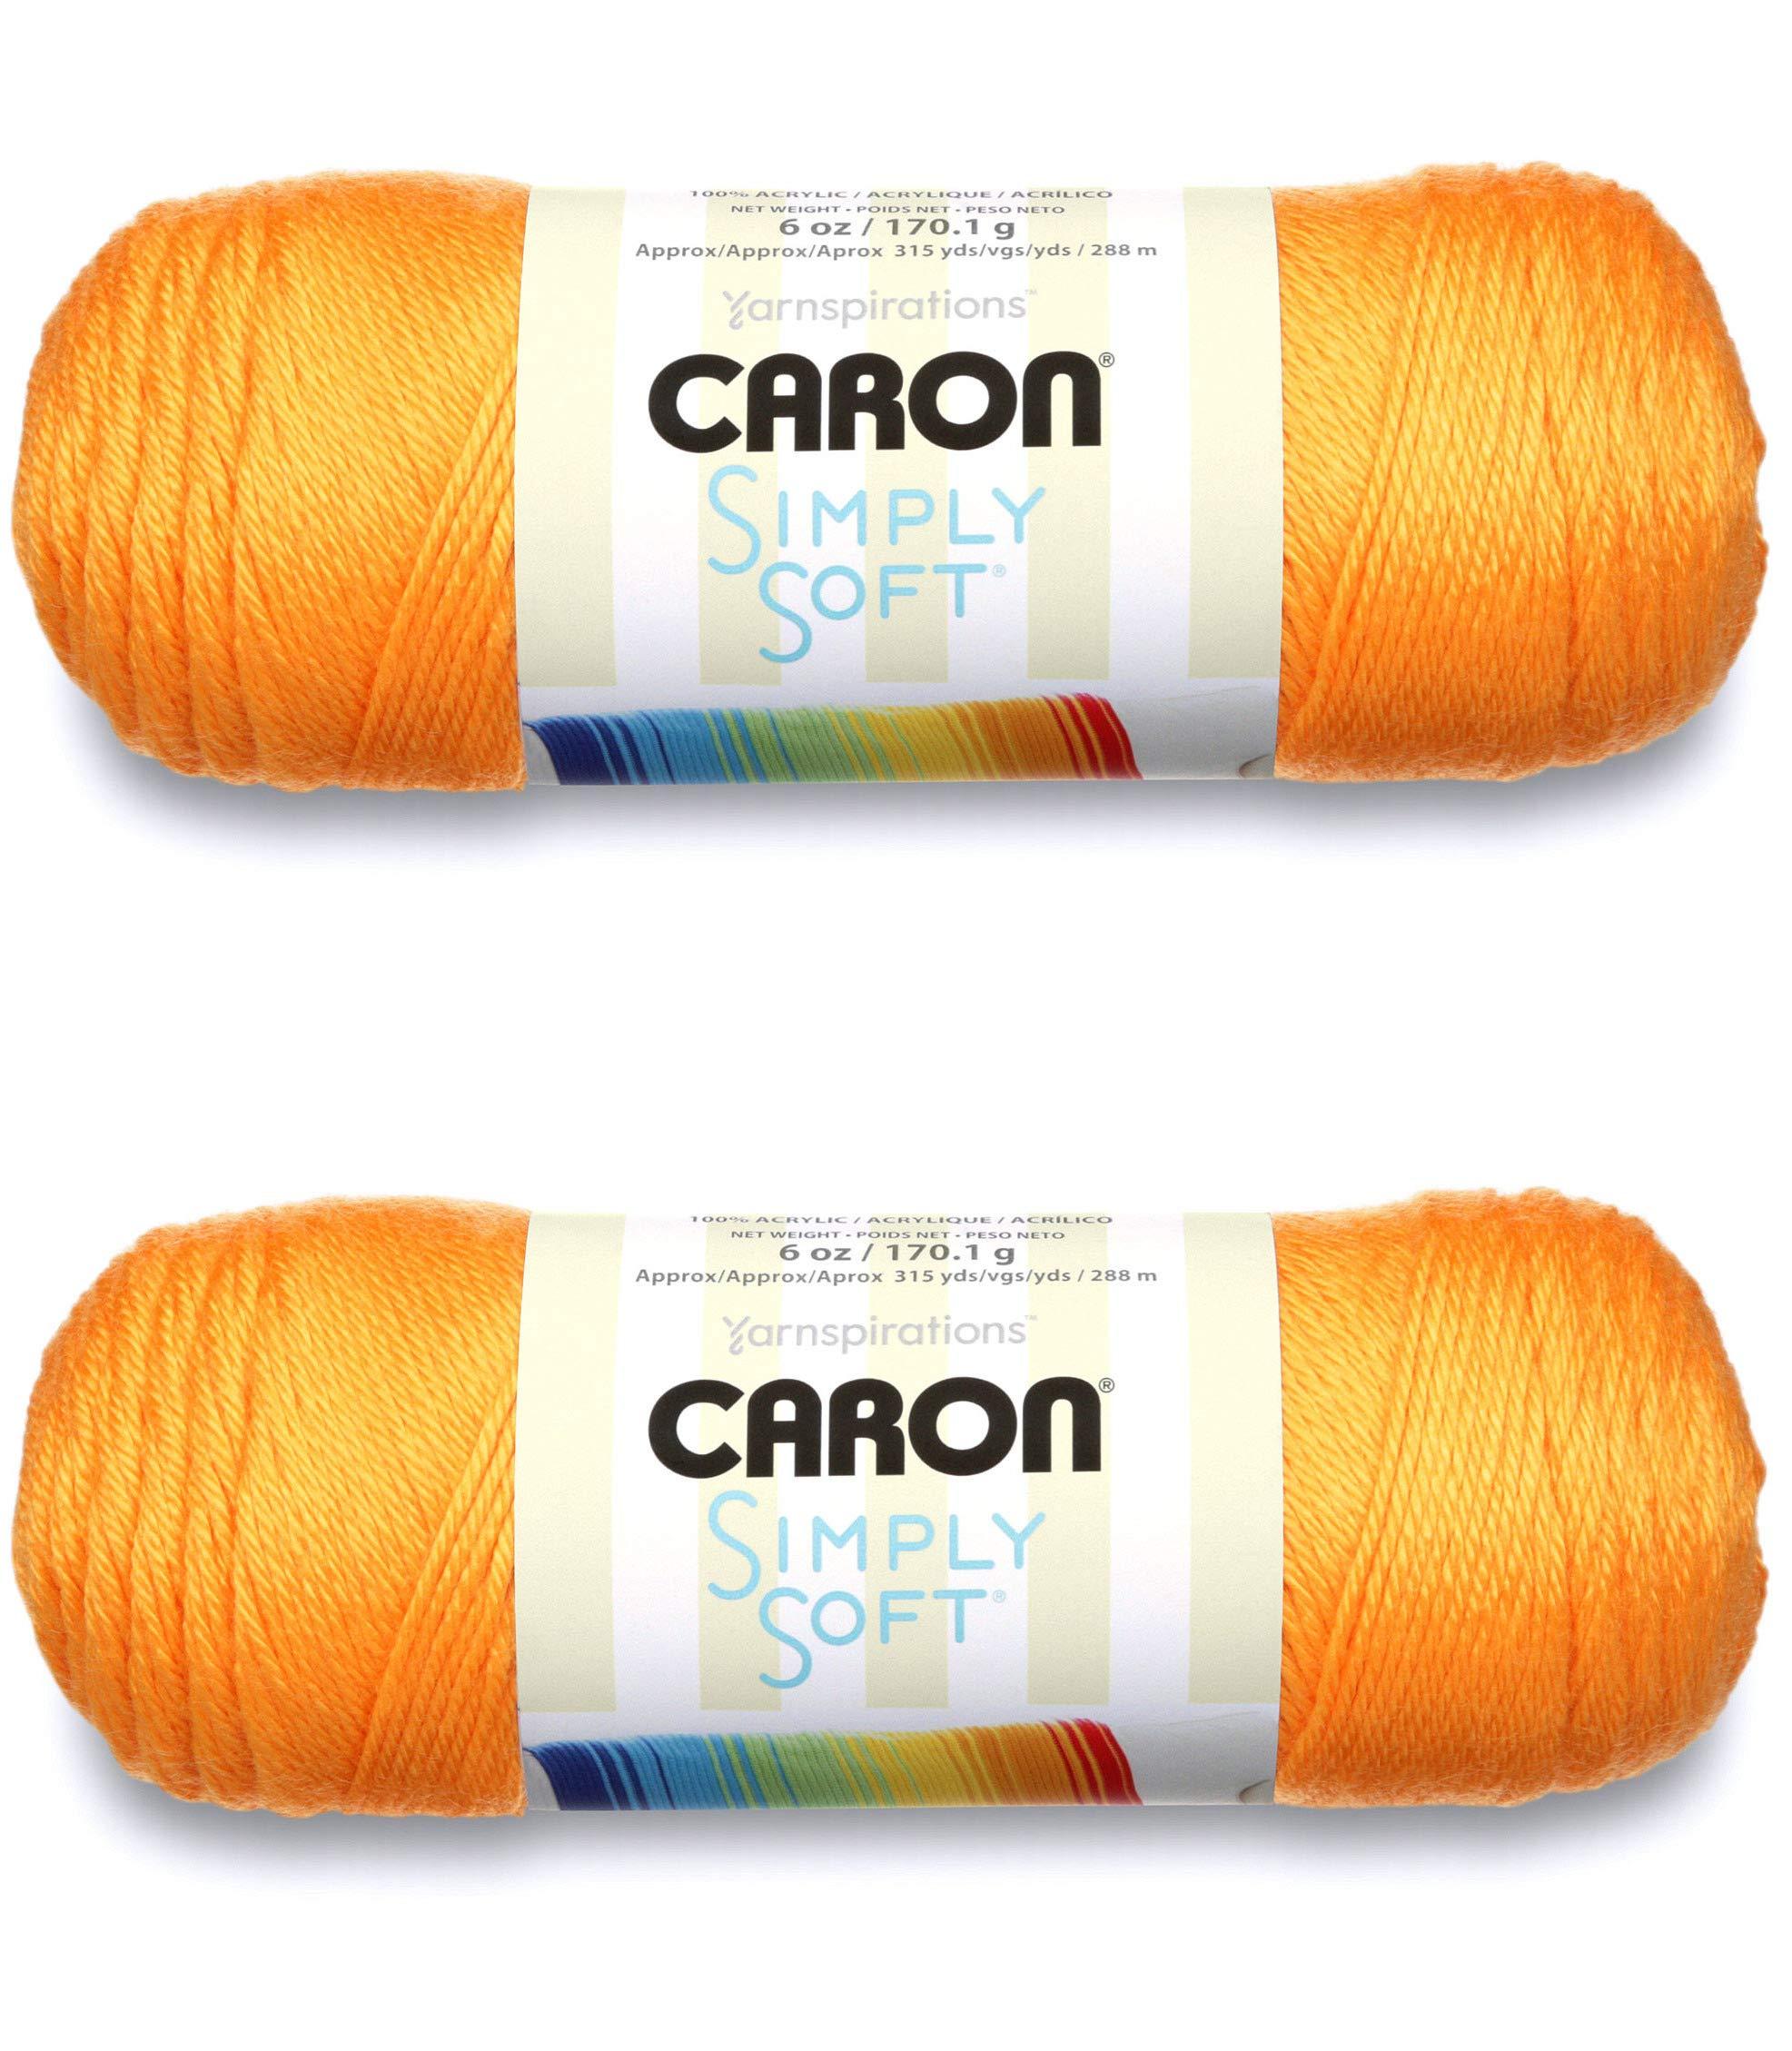 Caron Simply Soft Brites - 2 只装球-170g 每只球-芒果